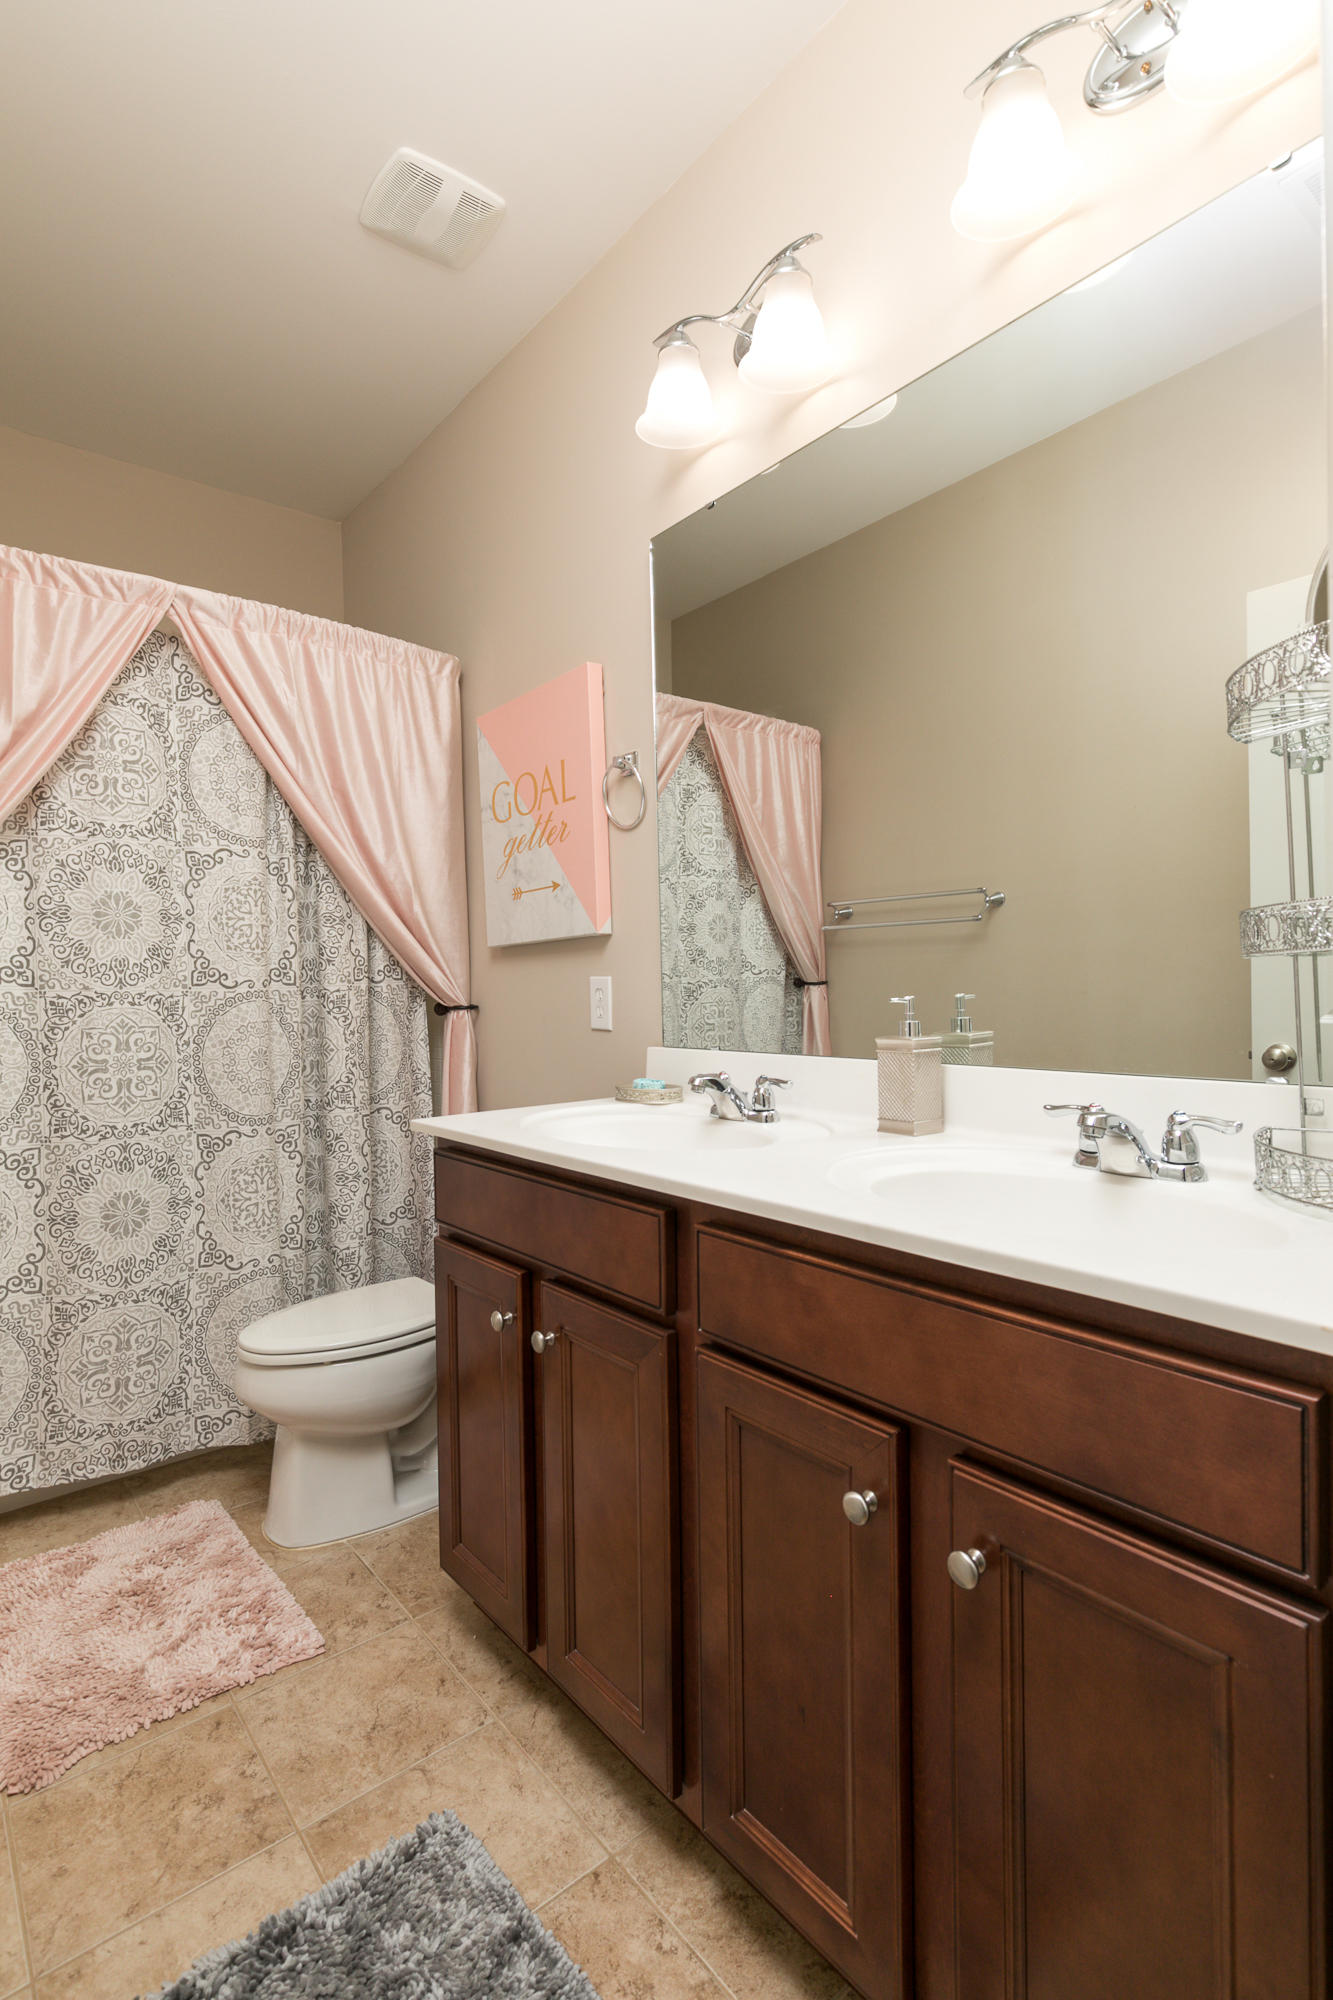 Carolina Park Homes For Sale - 1472 Croaton, Mount Pleasant, SC - 4